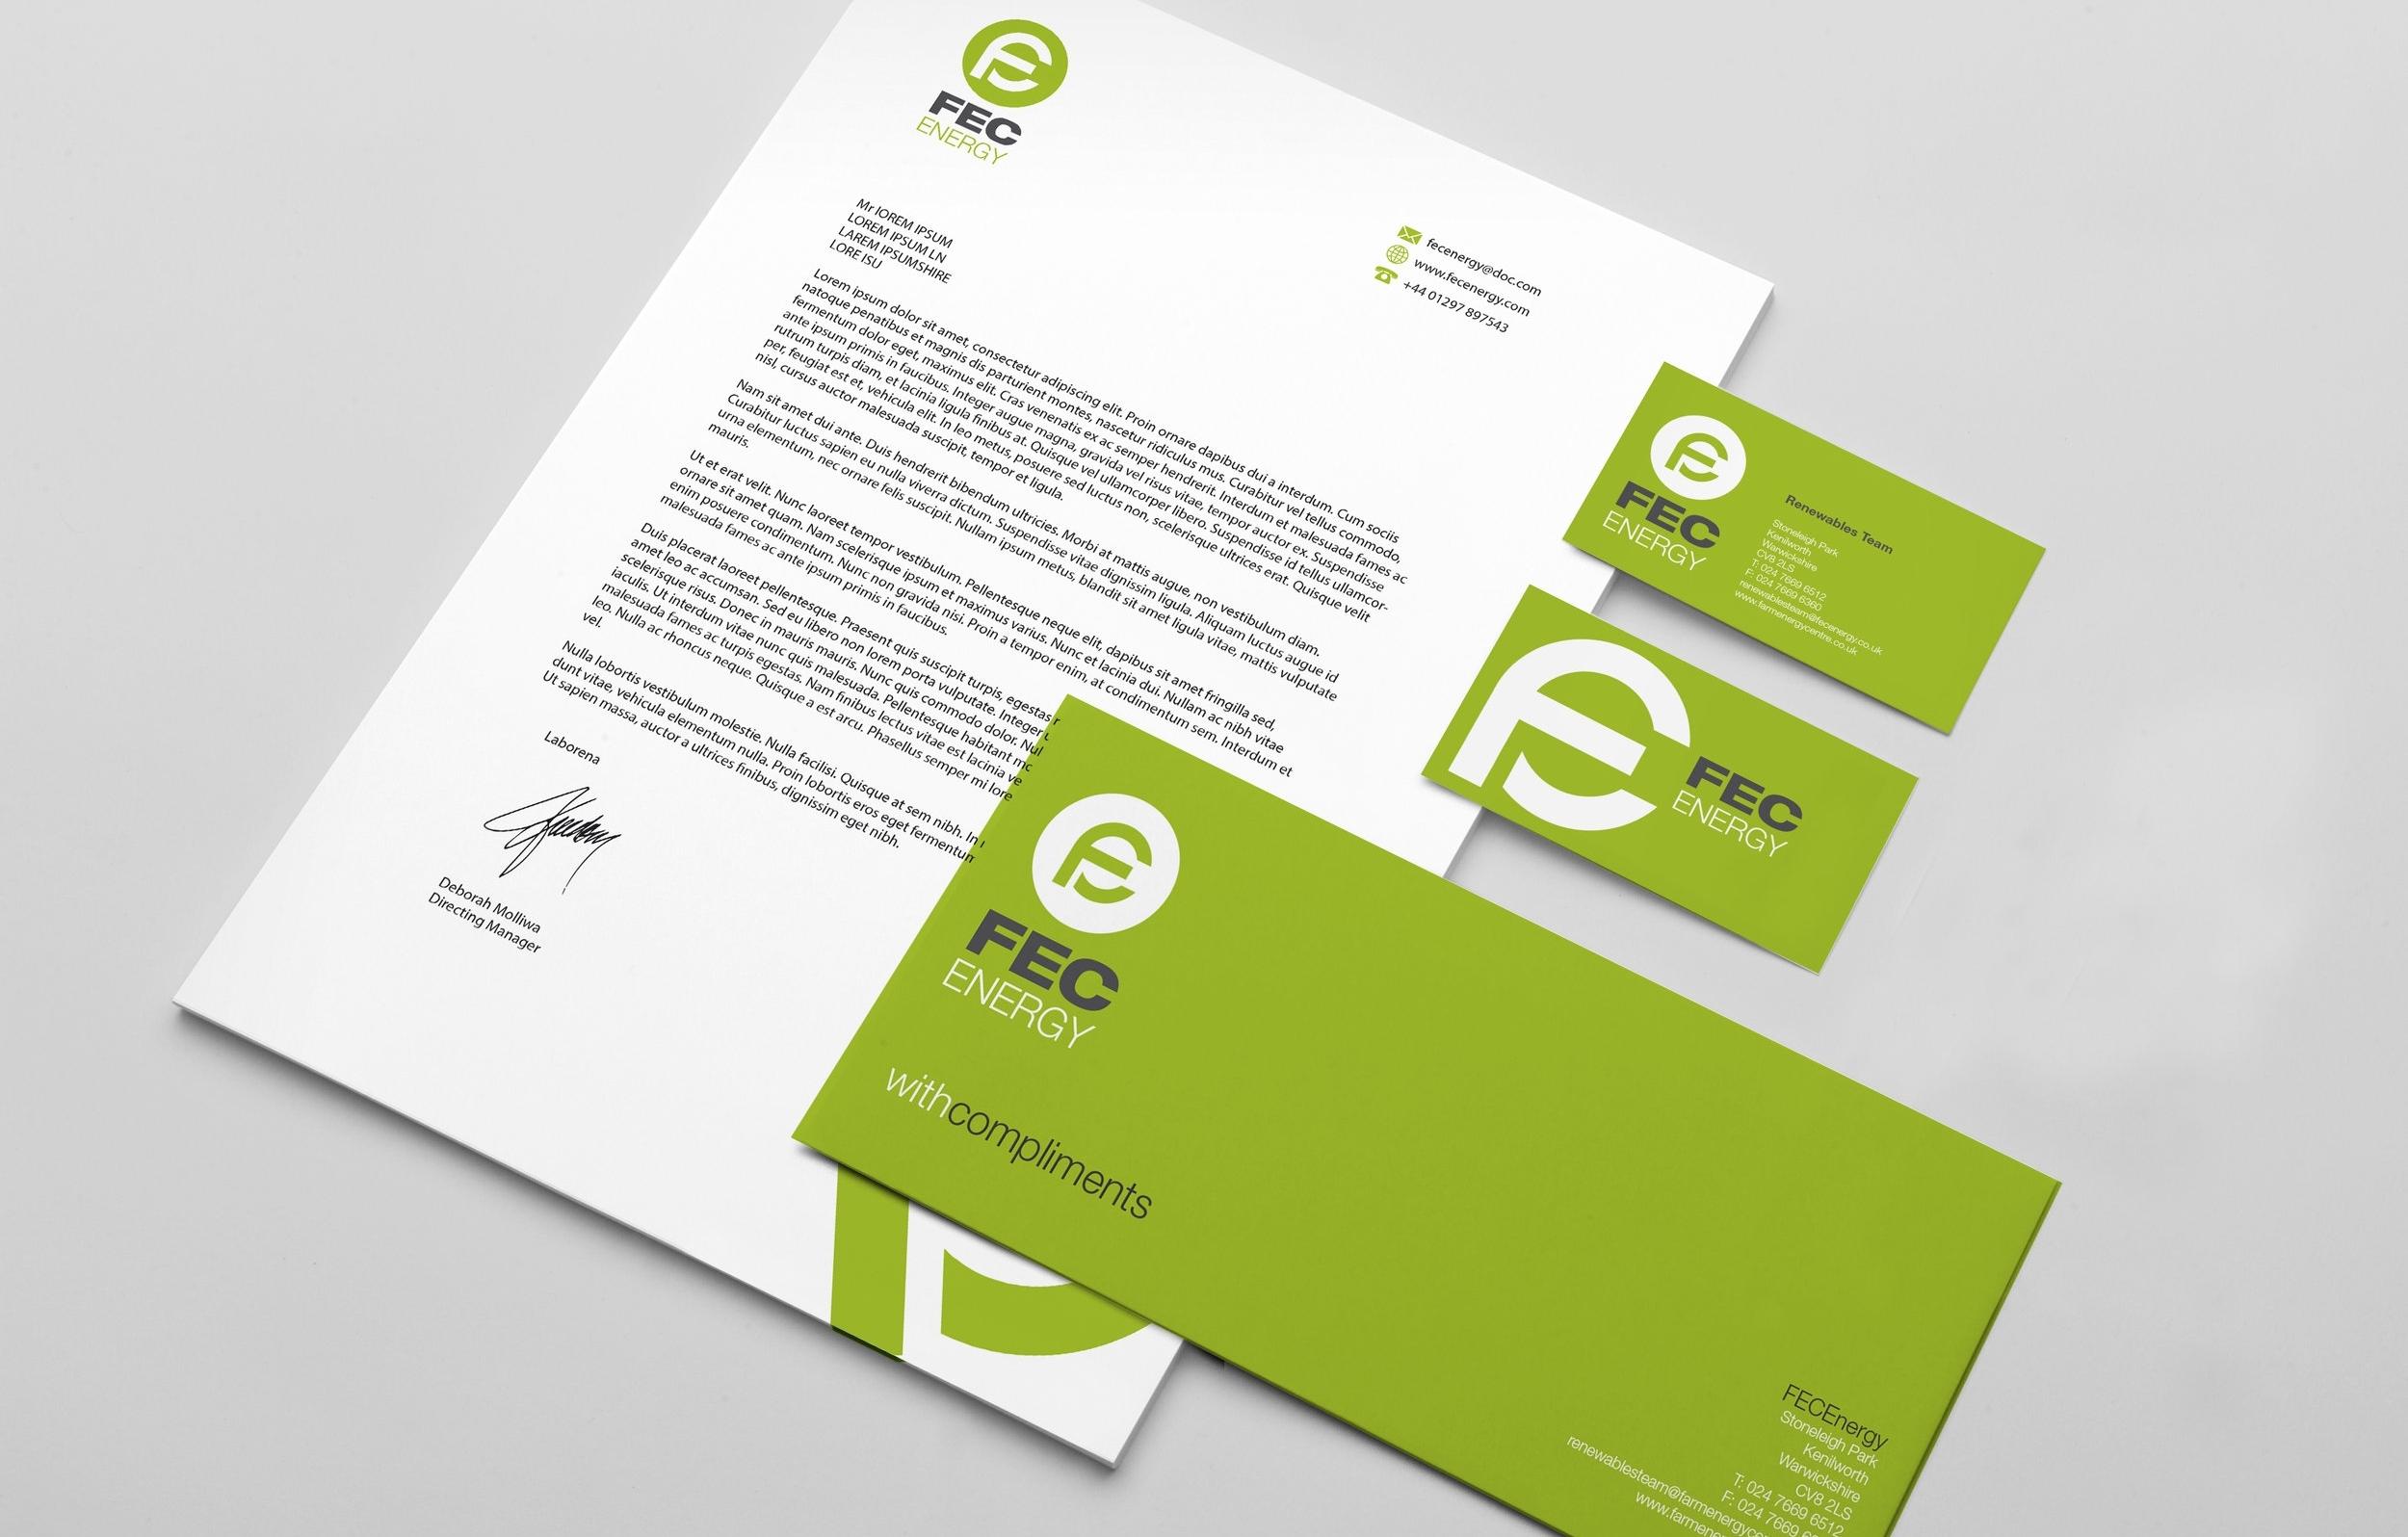 b+Business+cards+green.jpg